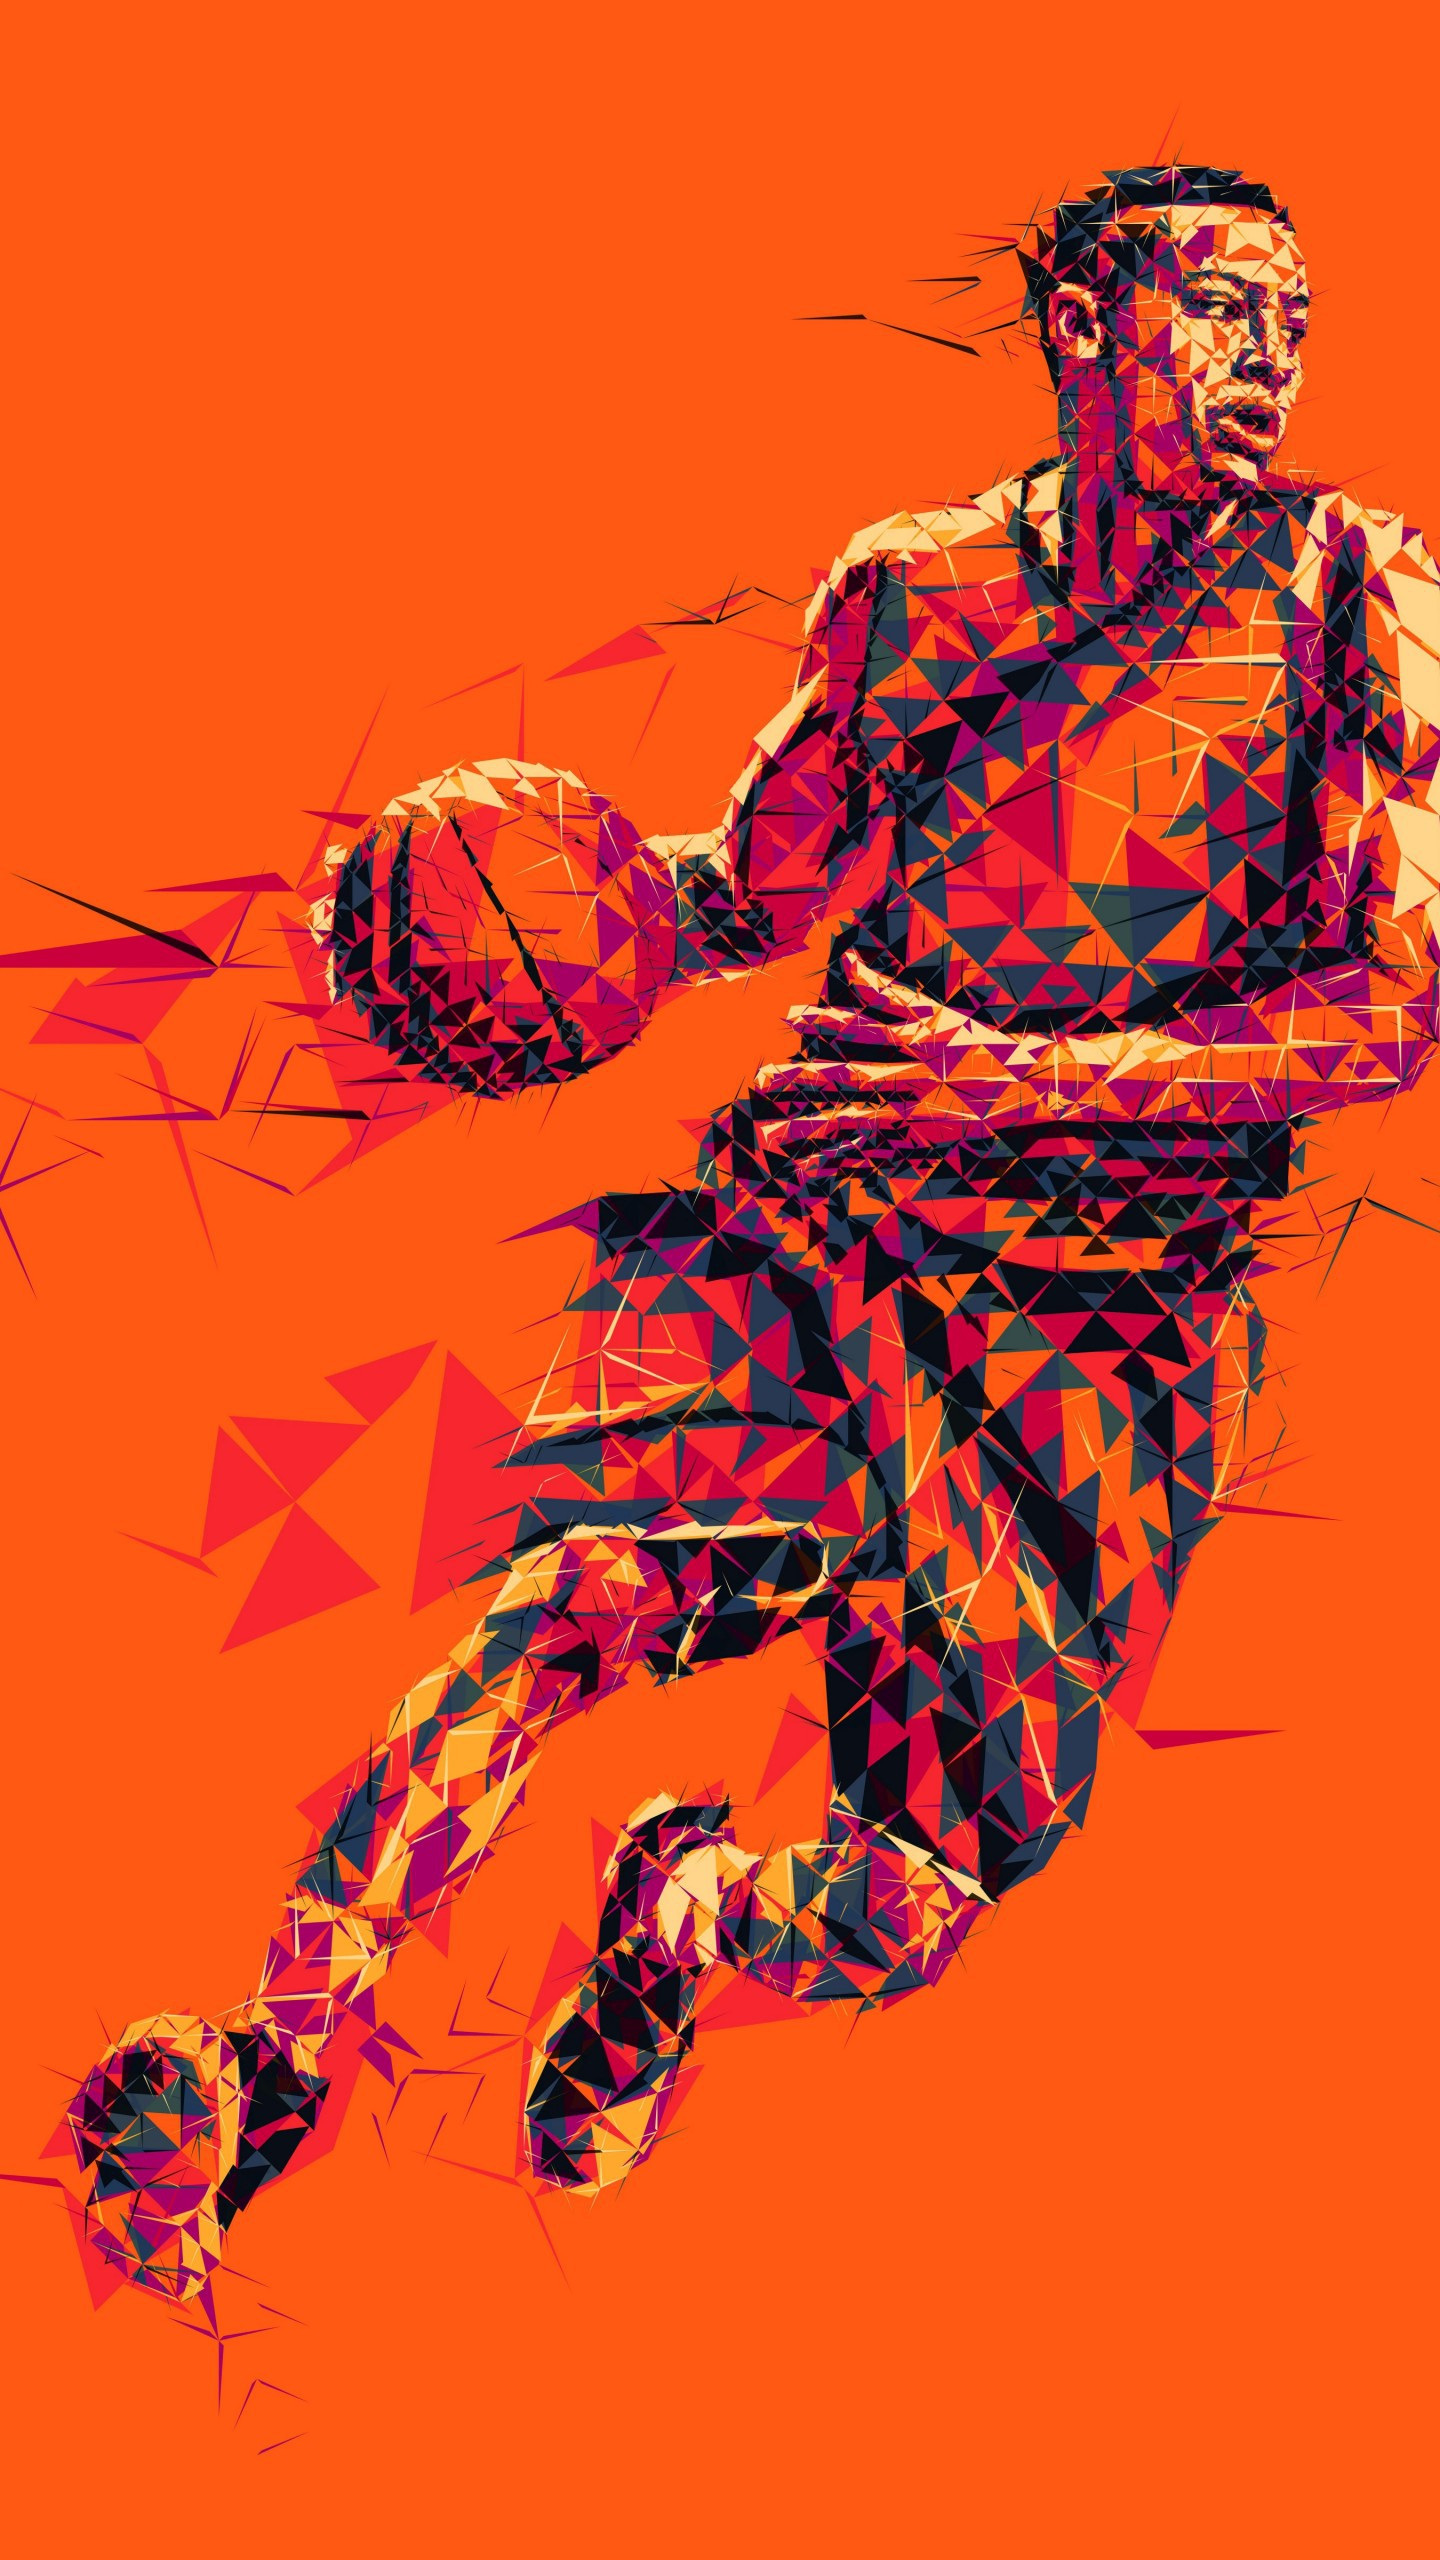 عکس زمینه عکس موزاییکی بازیکن بسکتبال پس زمینه